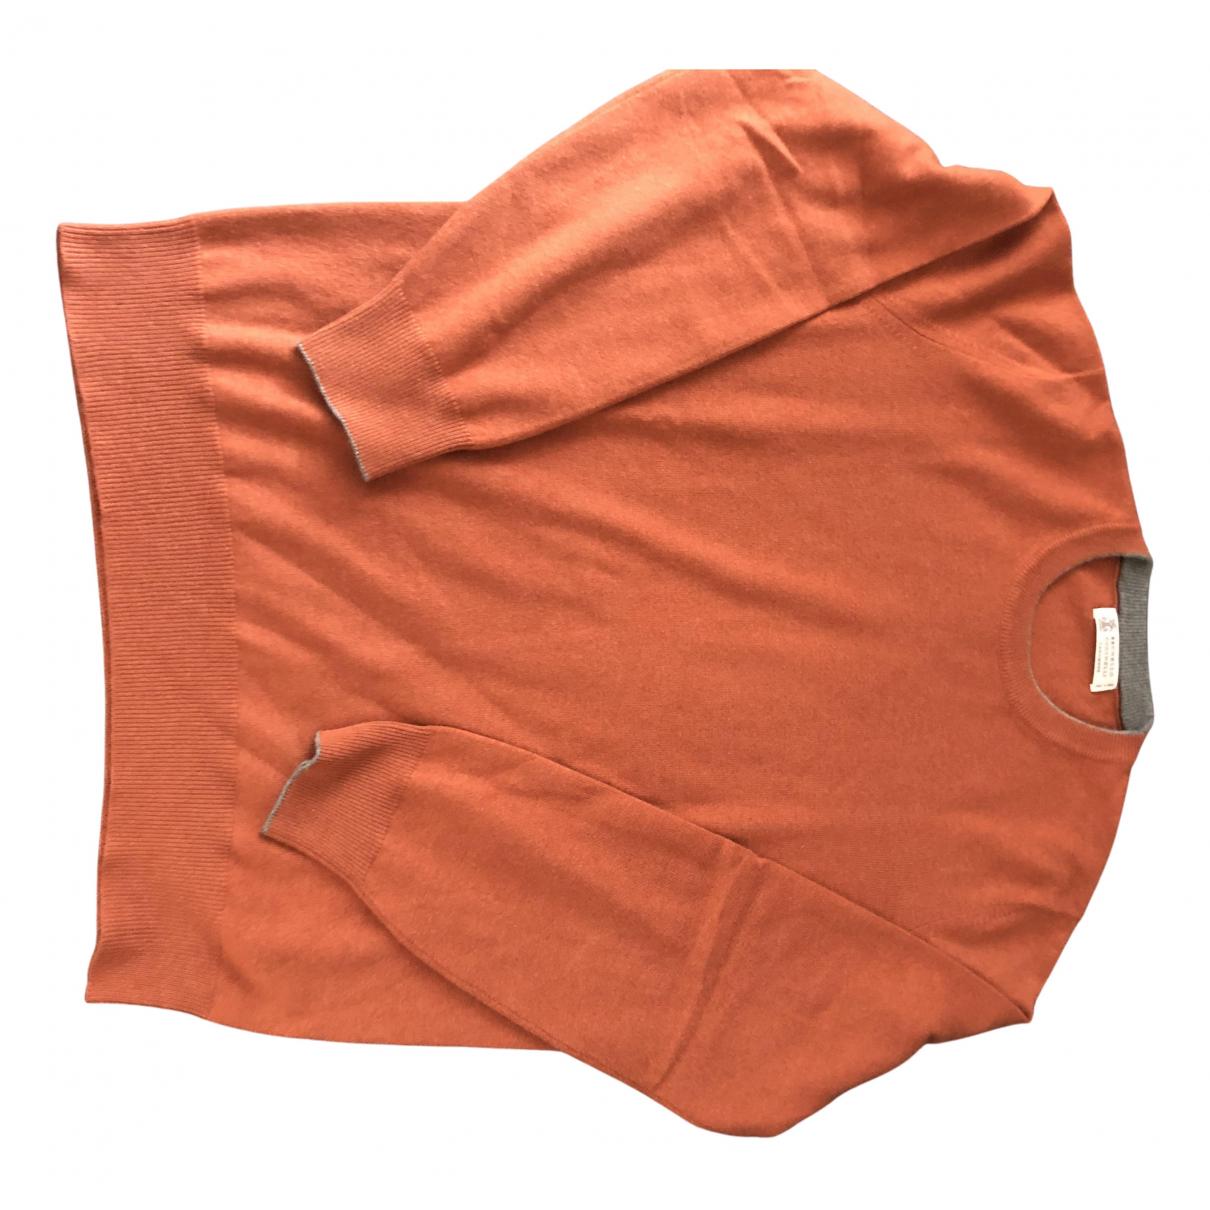 Brunello Cucinelli N Orange Cashmere Knitwear & Sweatshirts for Men 52 IT